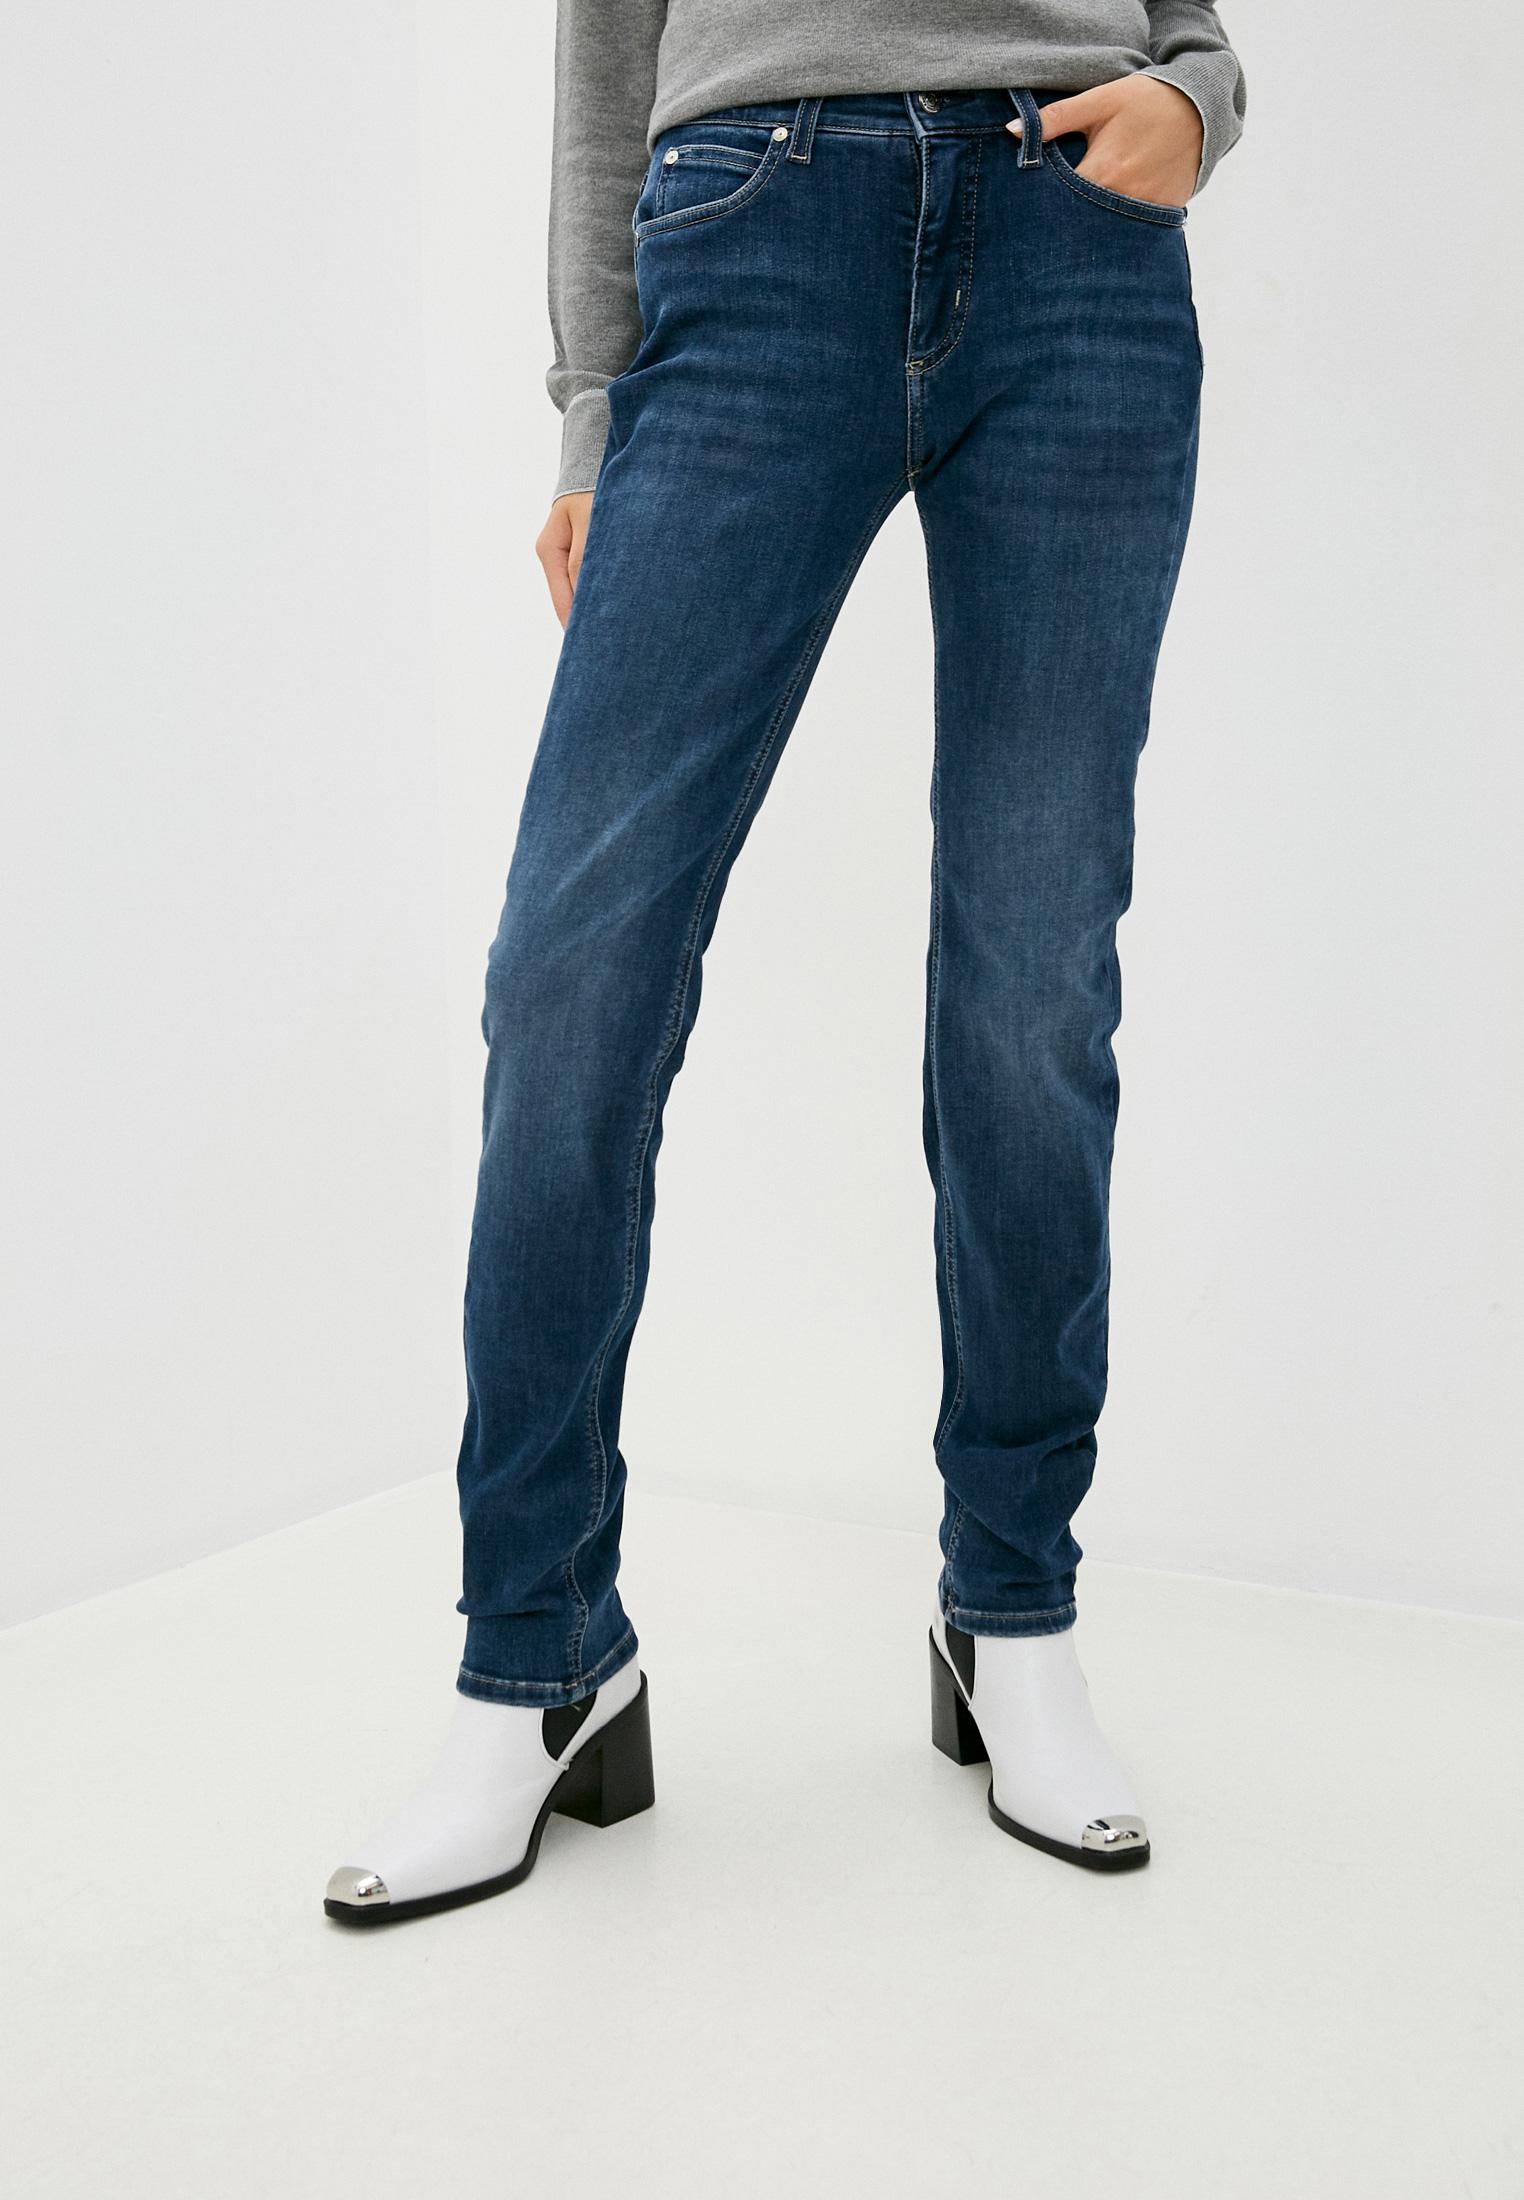 Зауженные джинсы Calvin Klein (Кельвин Кляйн) K20K202409